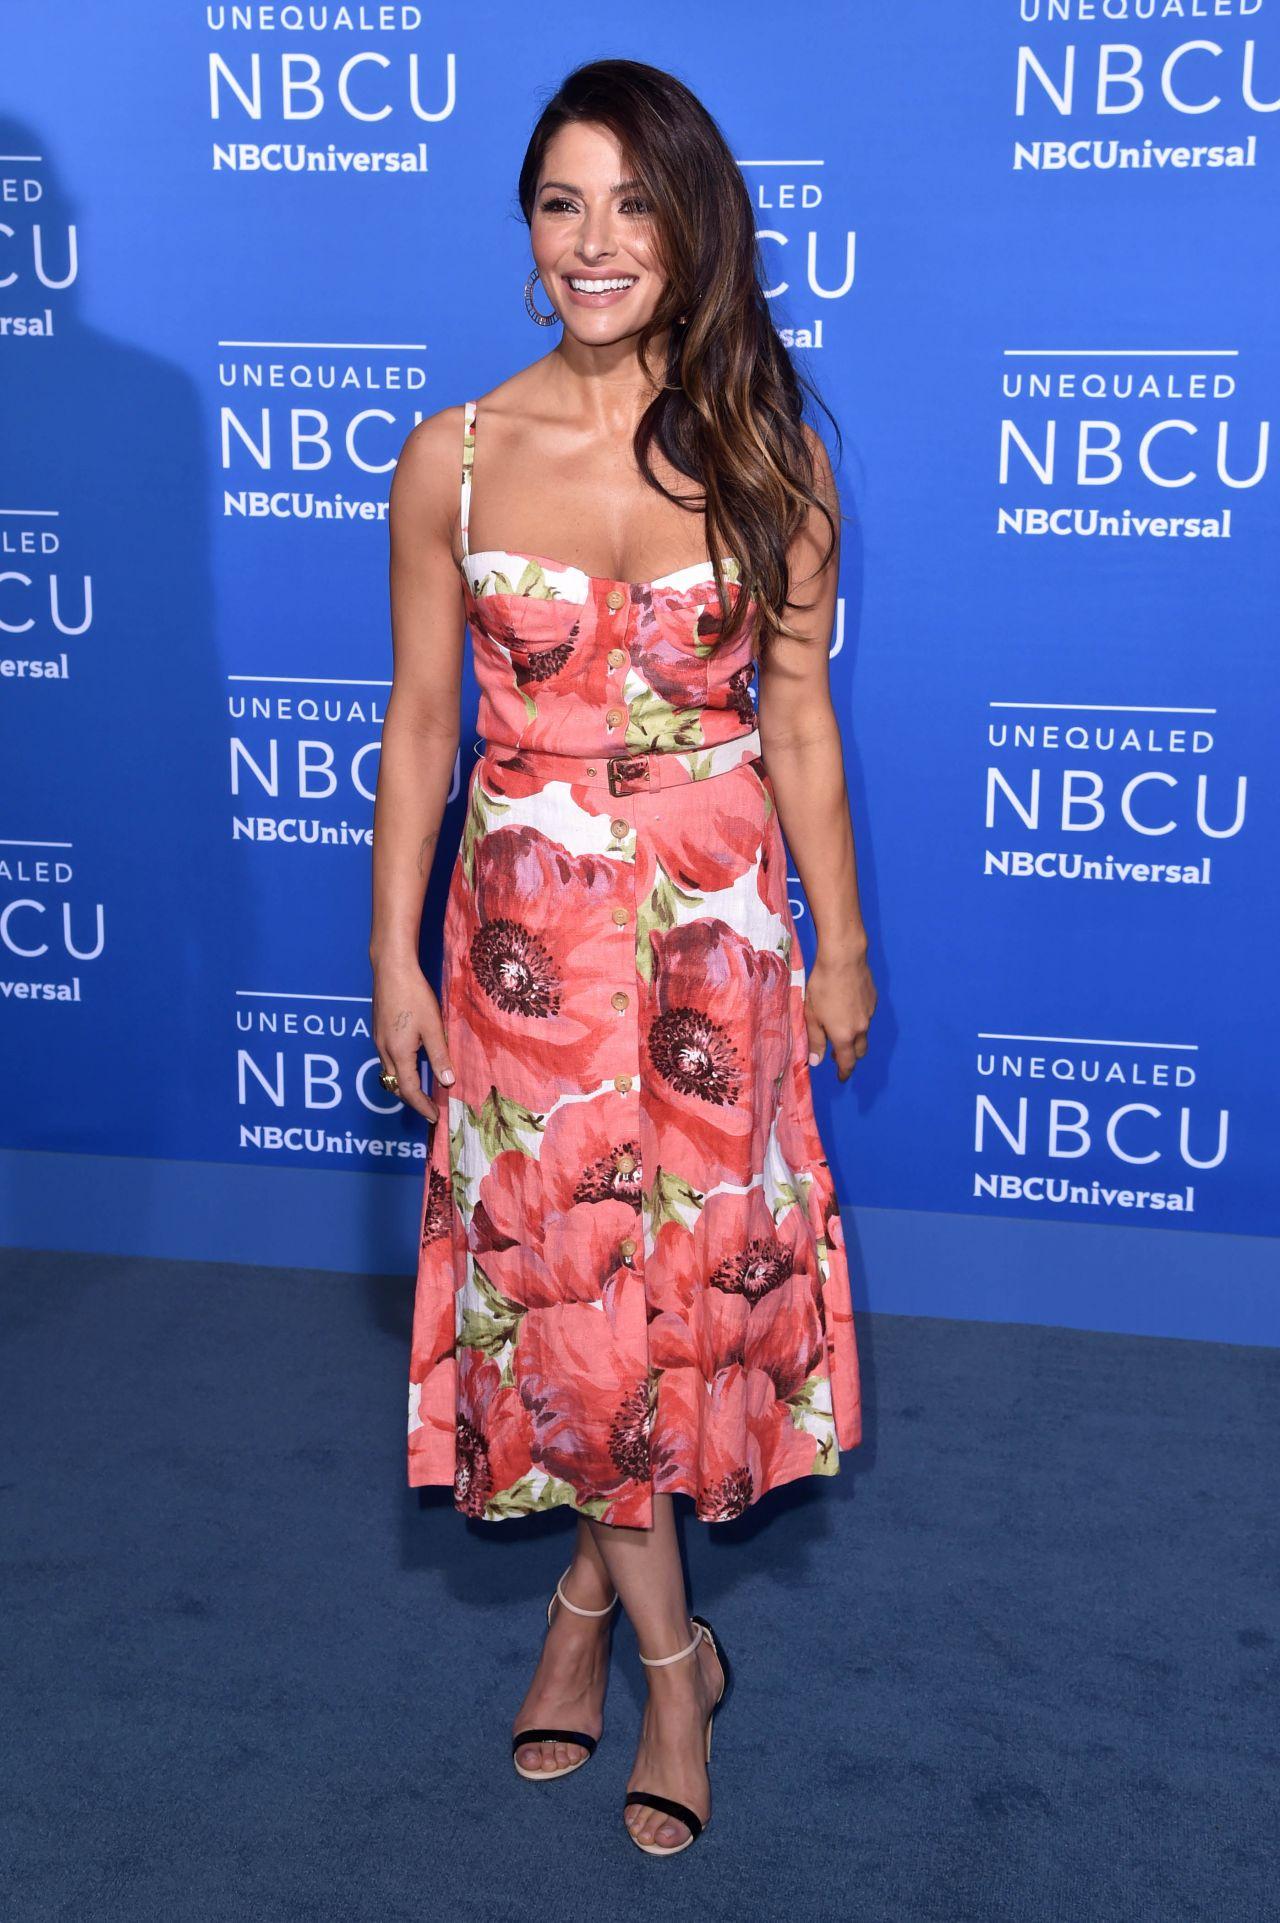 Sarah Shahi NBCUniversal Upfront In NYC 05152017